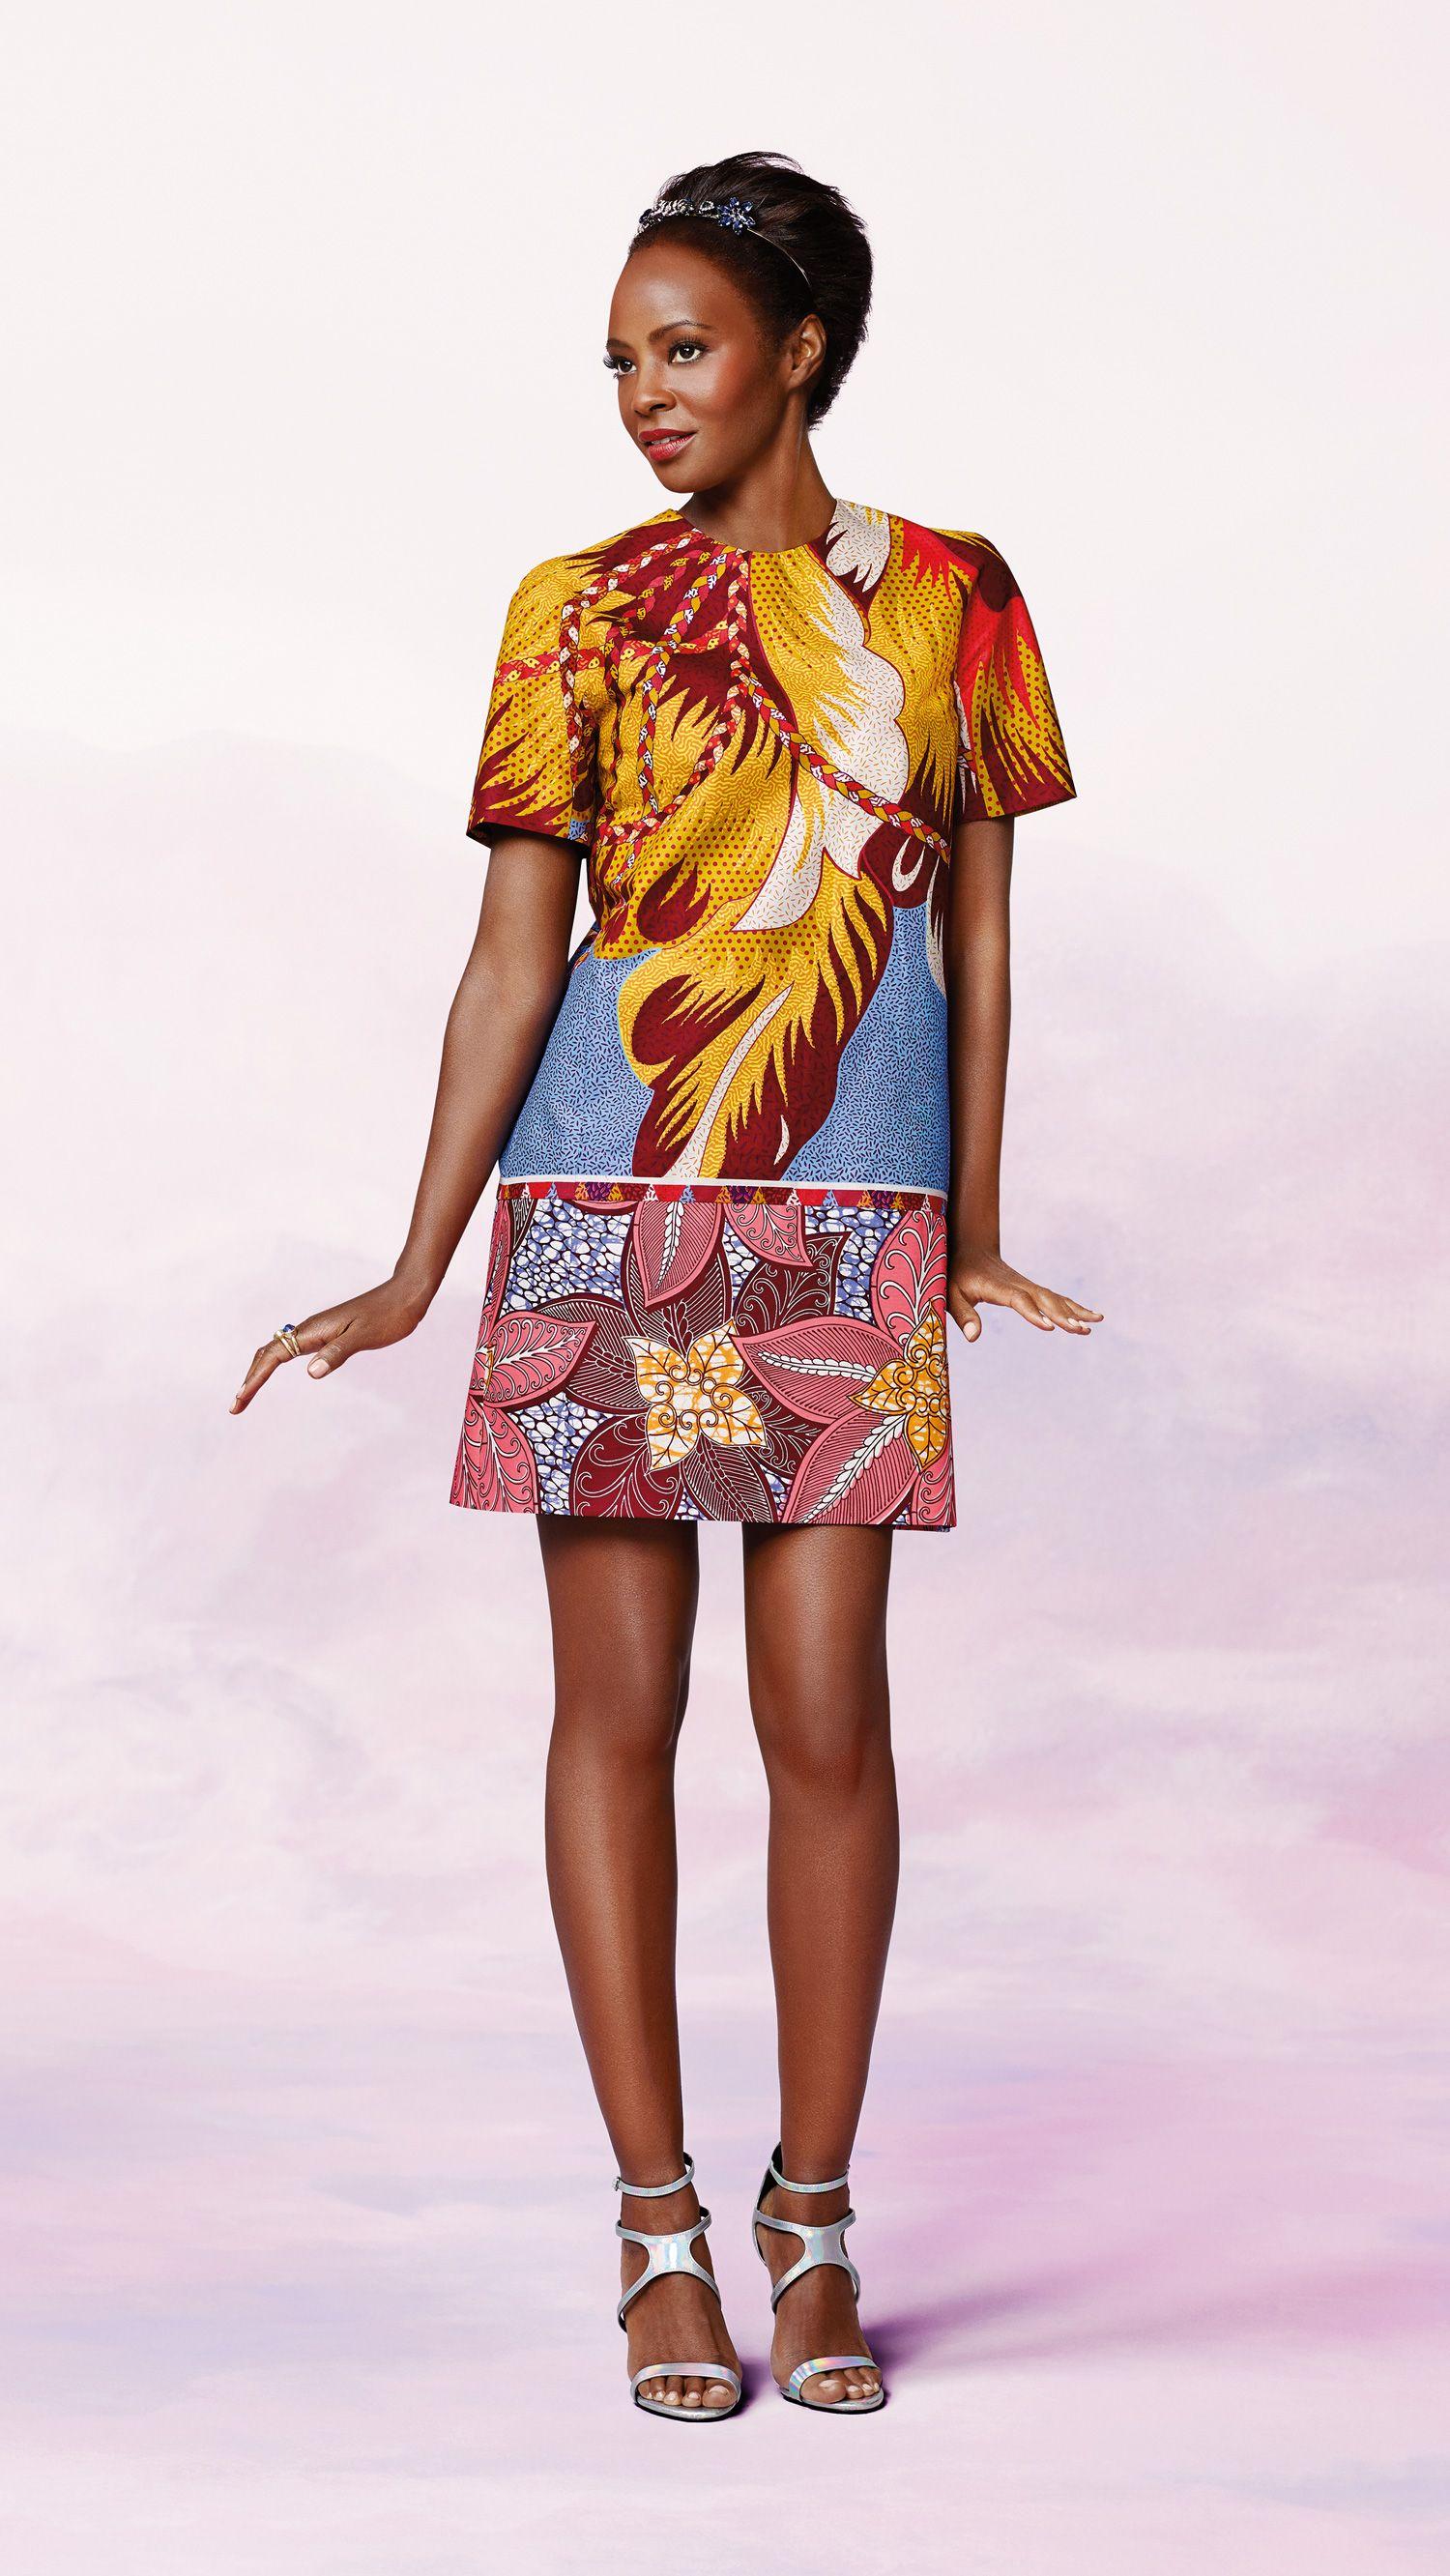 Bloom Vlisco #ItsAllAboutAfricanFashion #AfricaFashionShortDress #AfricanPrints #kente #ankara #AfricanStyle #AfricanFashion #AfricanInspired #StyleAfrica #AfricanBeauty #AfricaInFashion